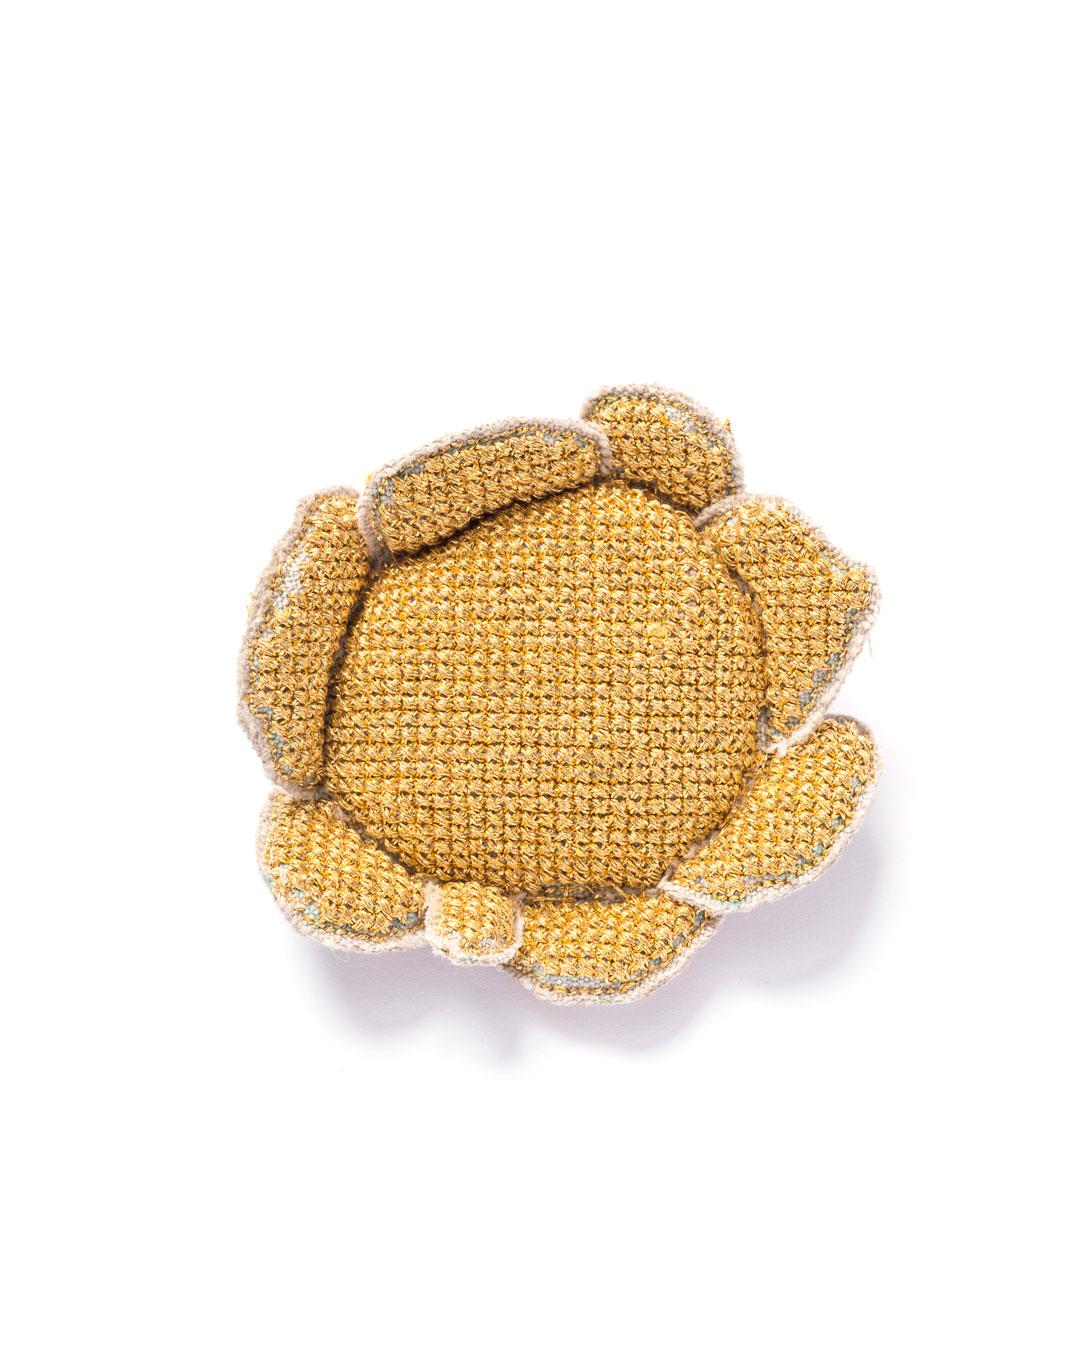 Carla Nuis, Golden Cuddles – Flower Brooch 5 (1/7), 2014, brooch; unbleached linen, 24ct gold kimono thread, linen flax fibres, 80 x 60 x 20 mm, €1530